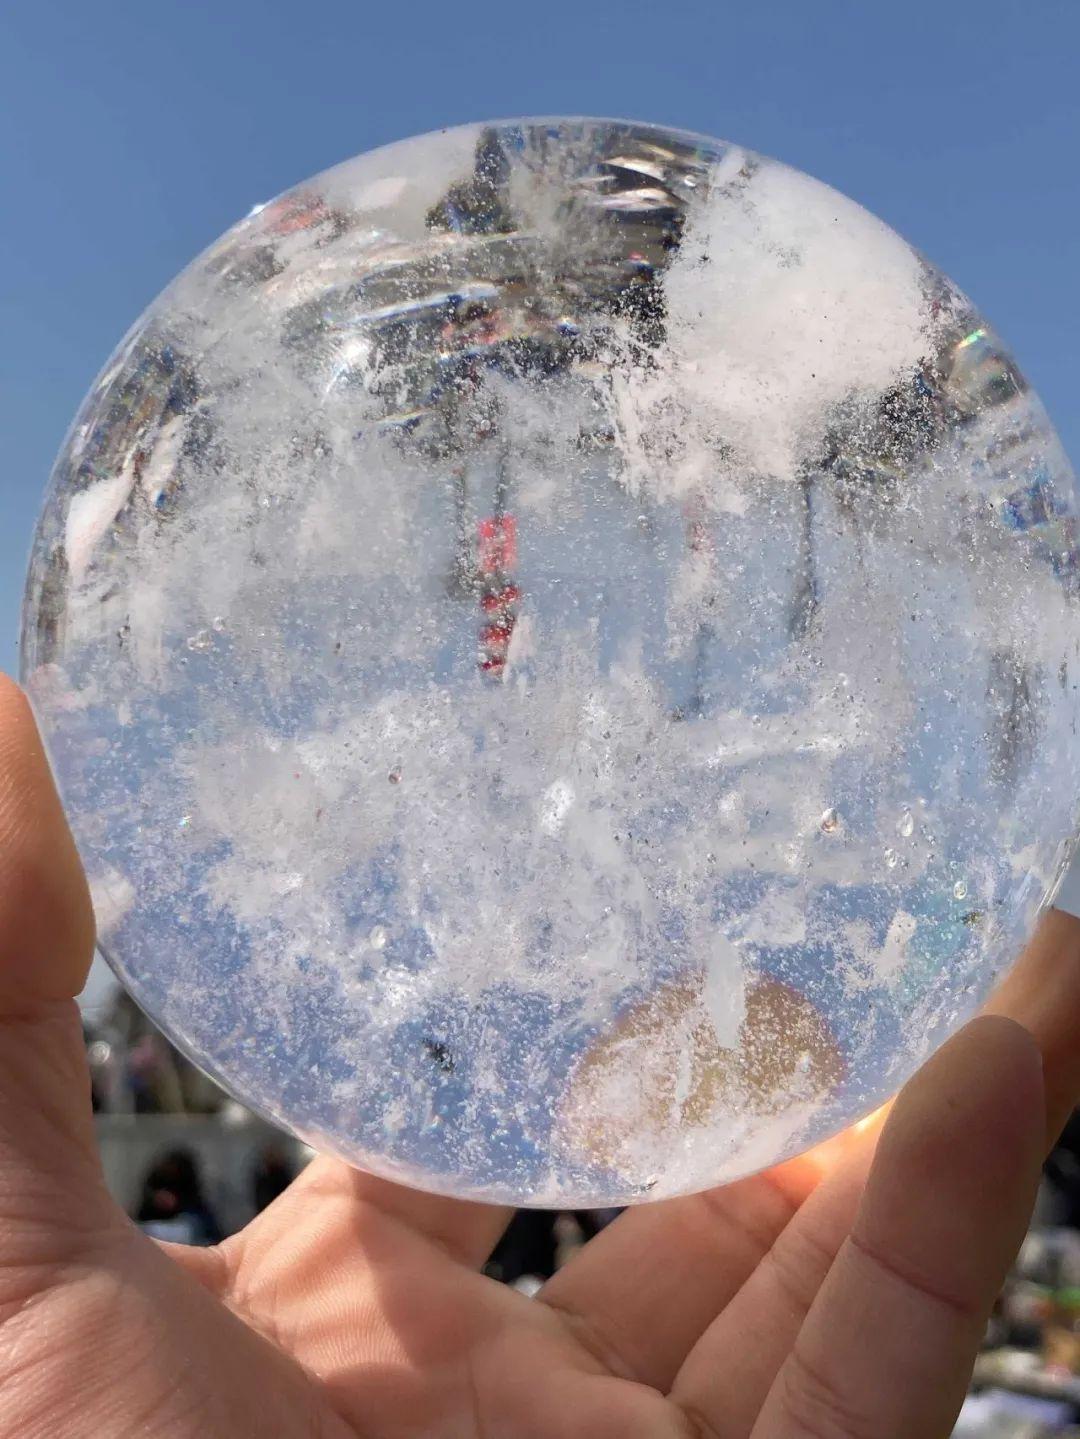 resize,m fill,h 1439,w 1080 - 天然水晶和人造水晶怎么分辨?有没有天然水晶和人造水晶放在一起的对比图呢?